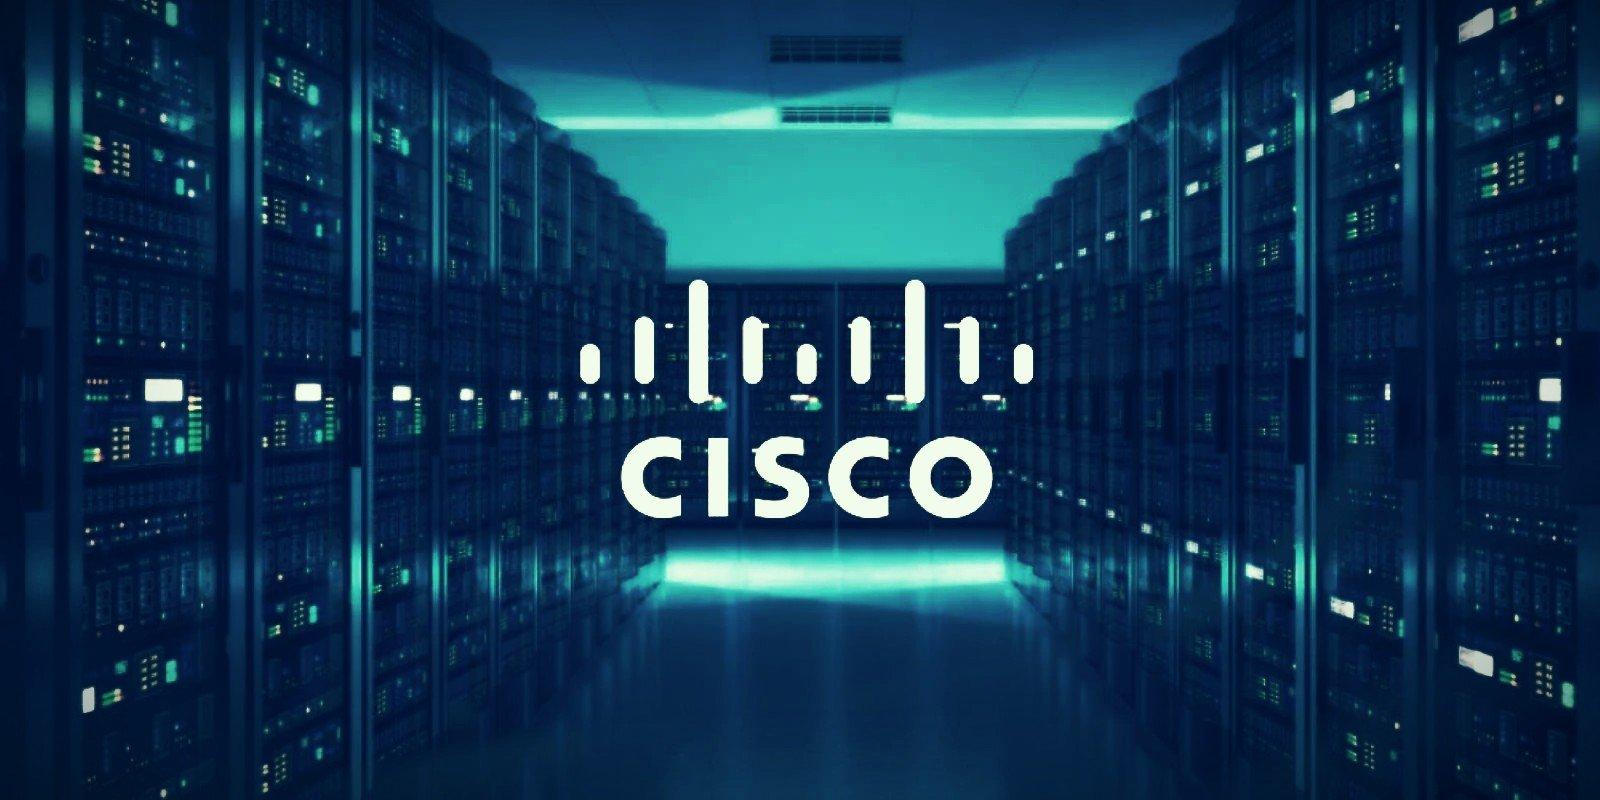 Cisco - سیسکو